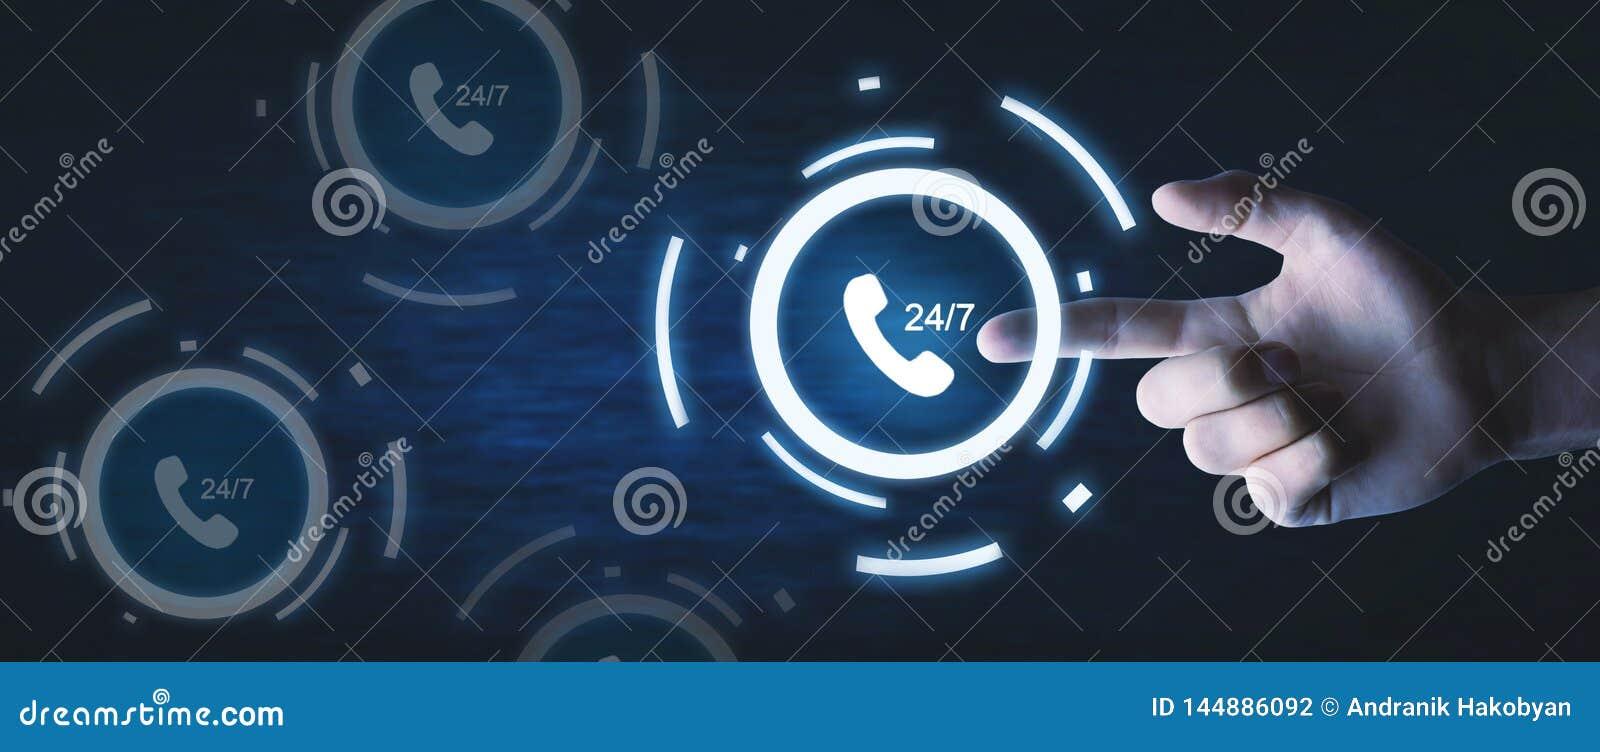 Call. 24/7 hour customer service